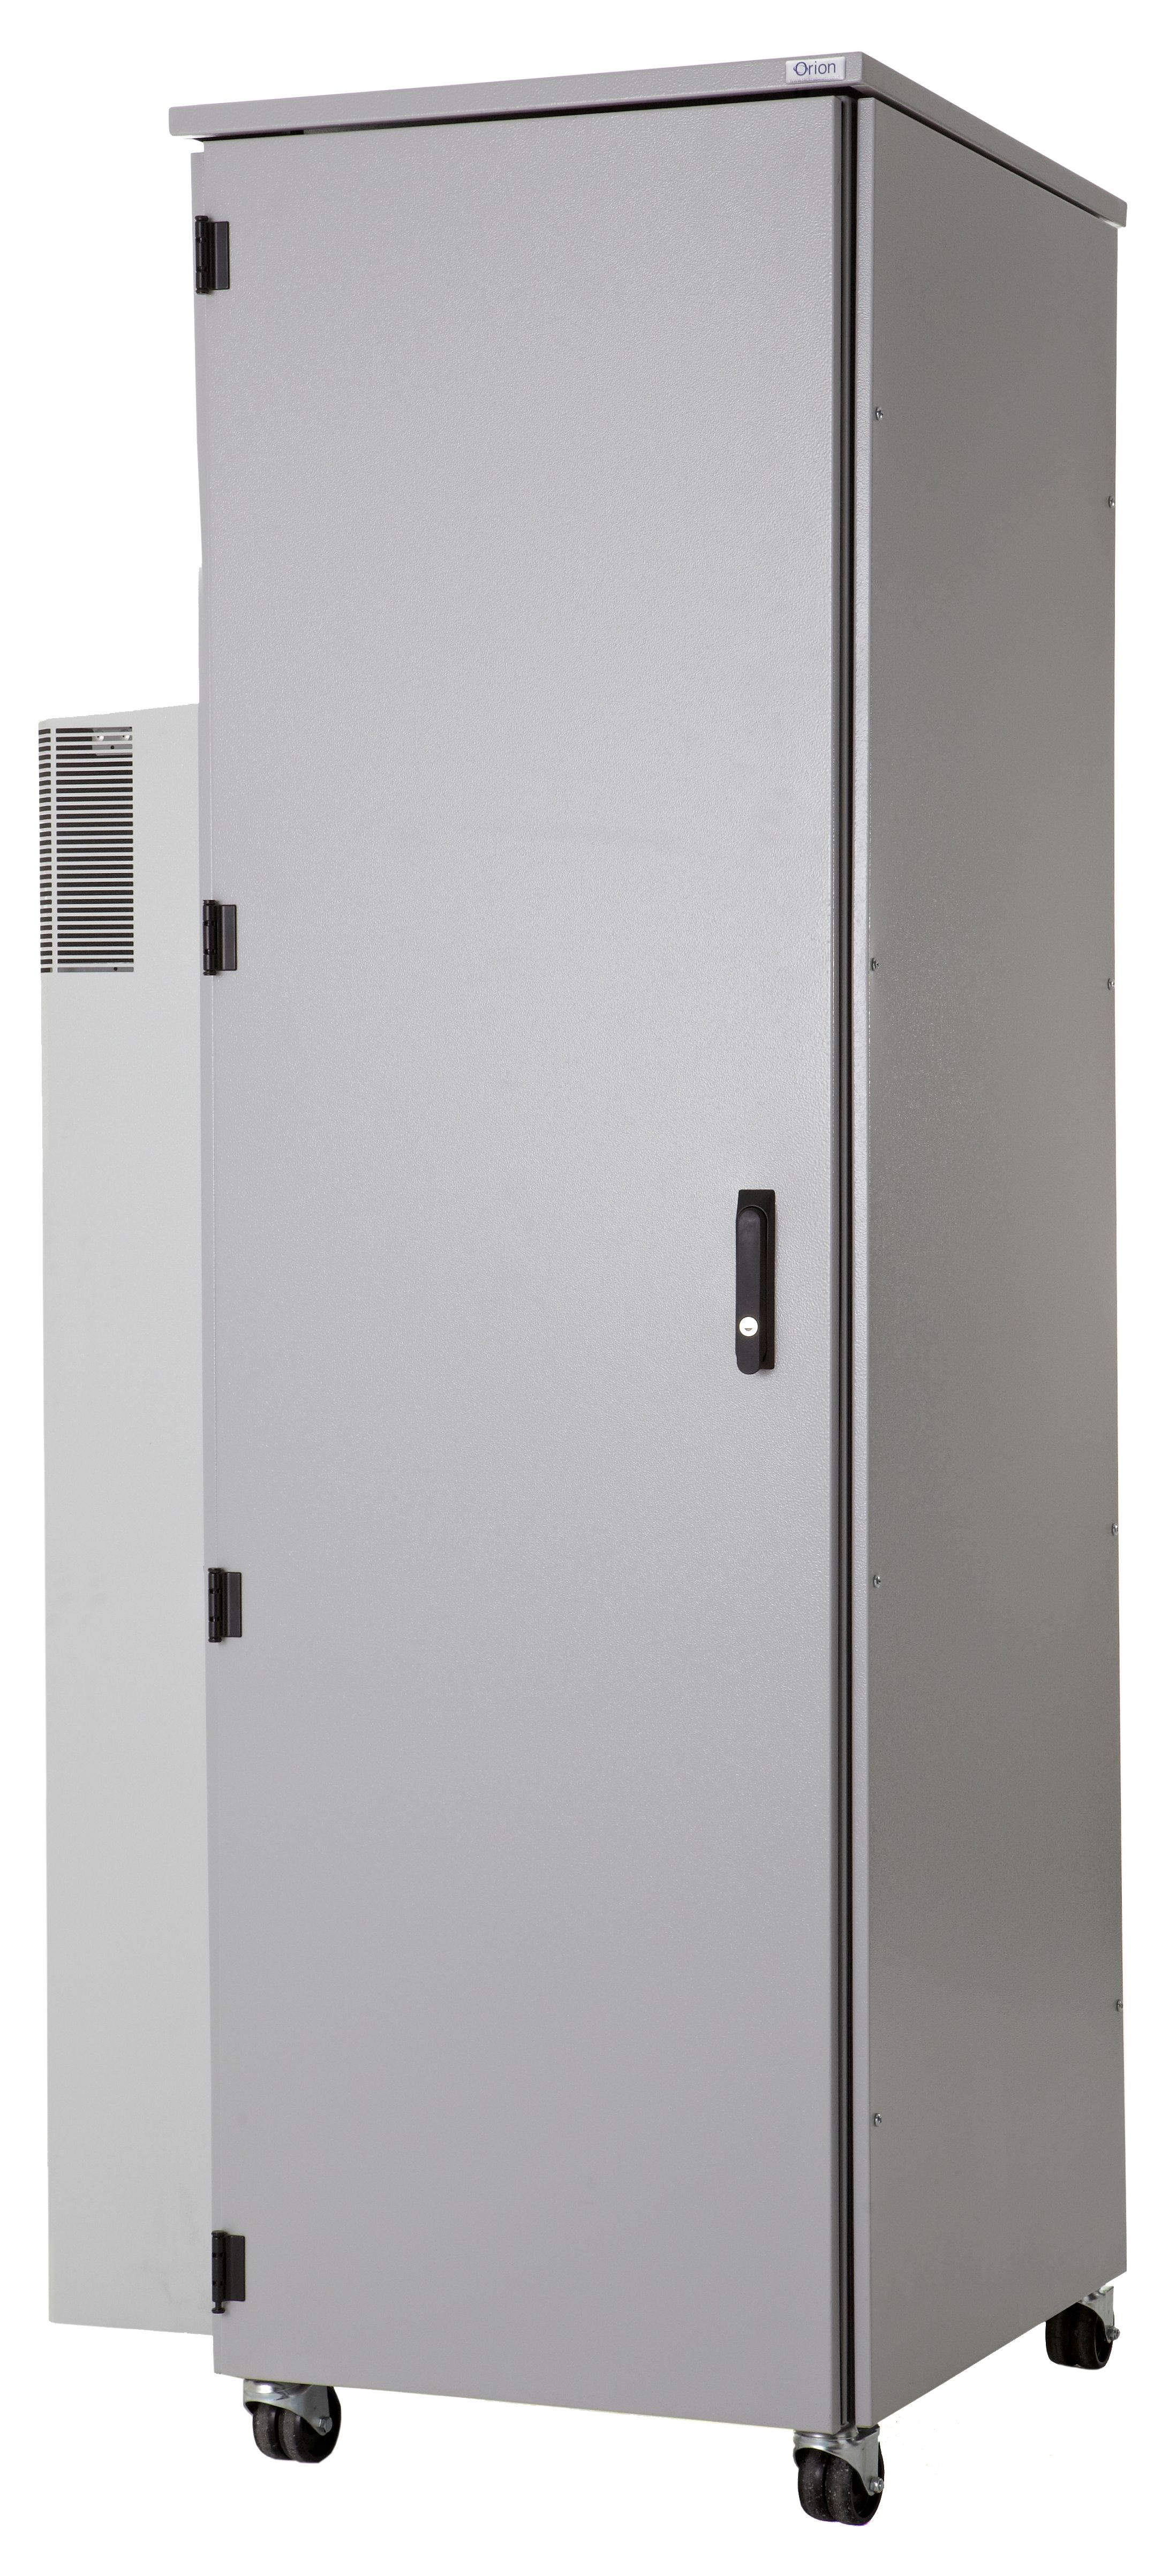 Pleasing Air Conditioned Server Cabinet Orion Rack Cabinets Interior Design Ideas Gentotthenellocom